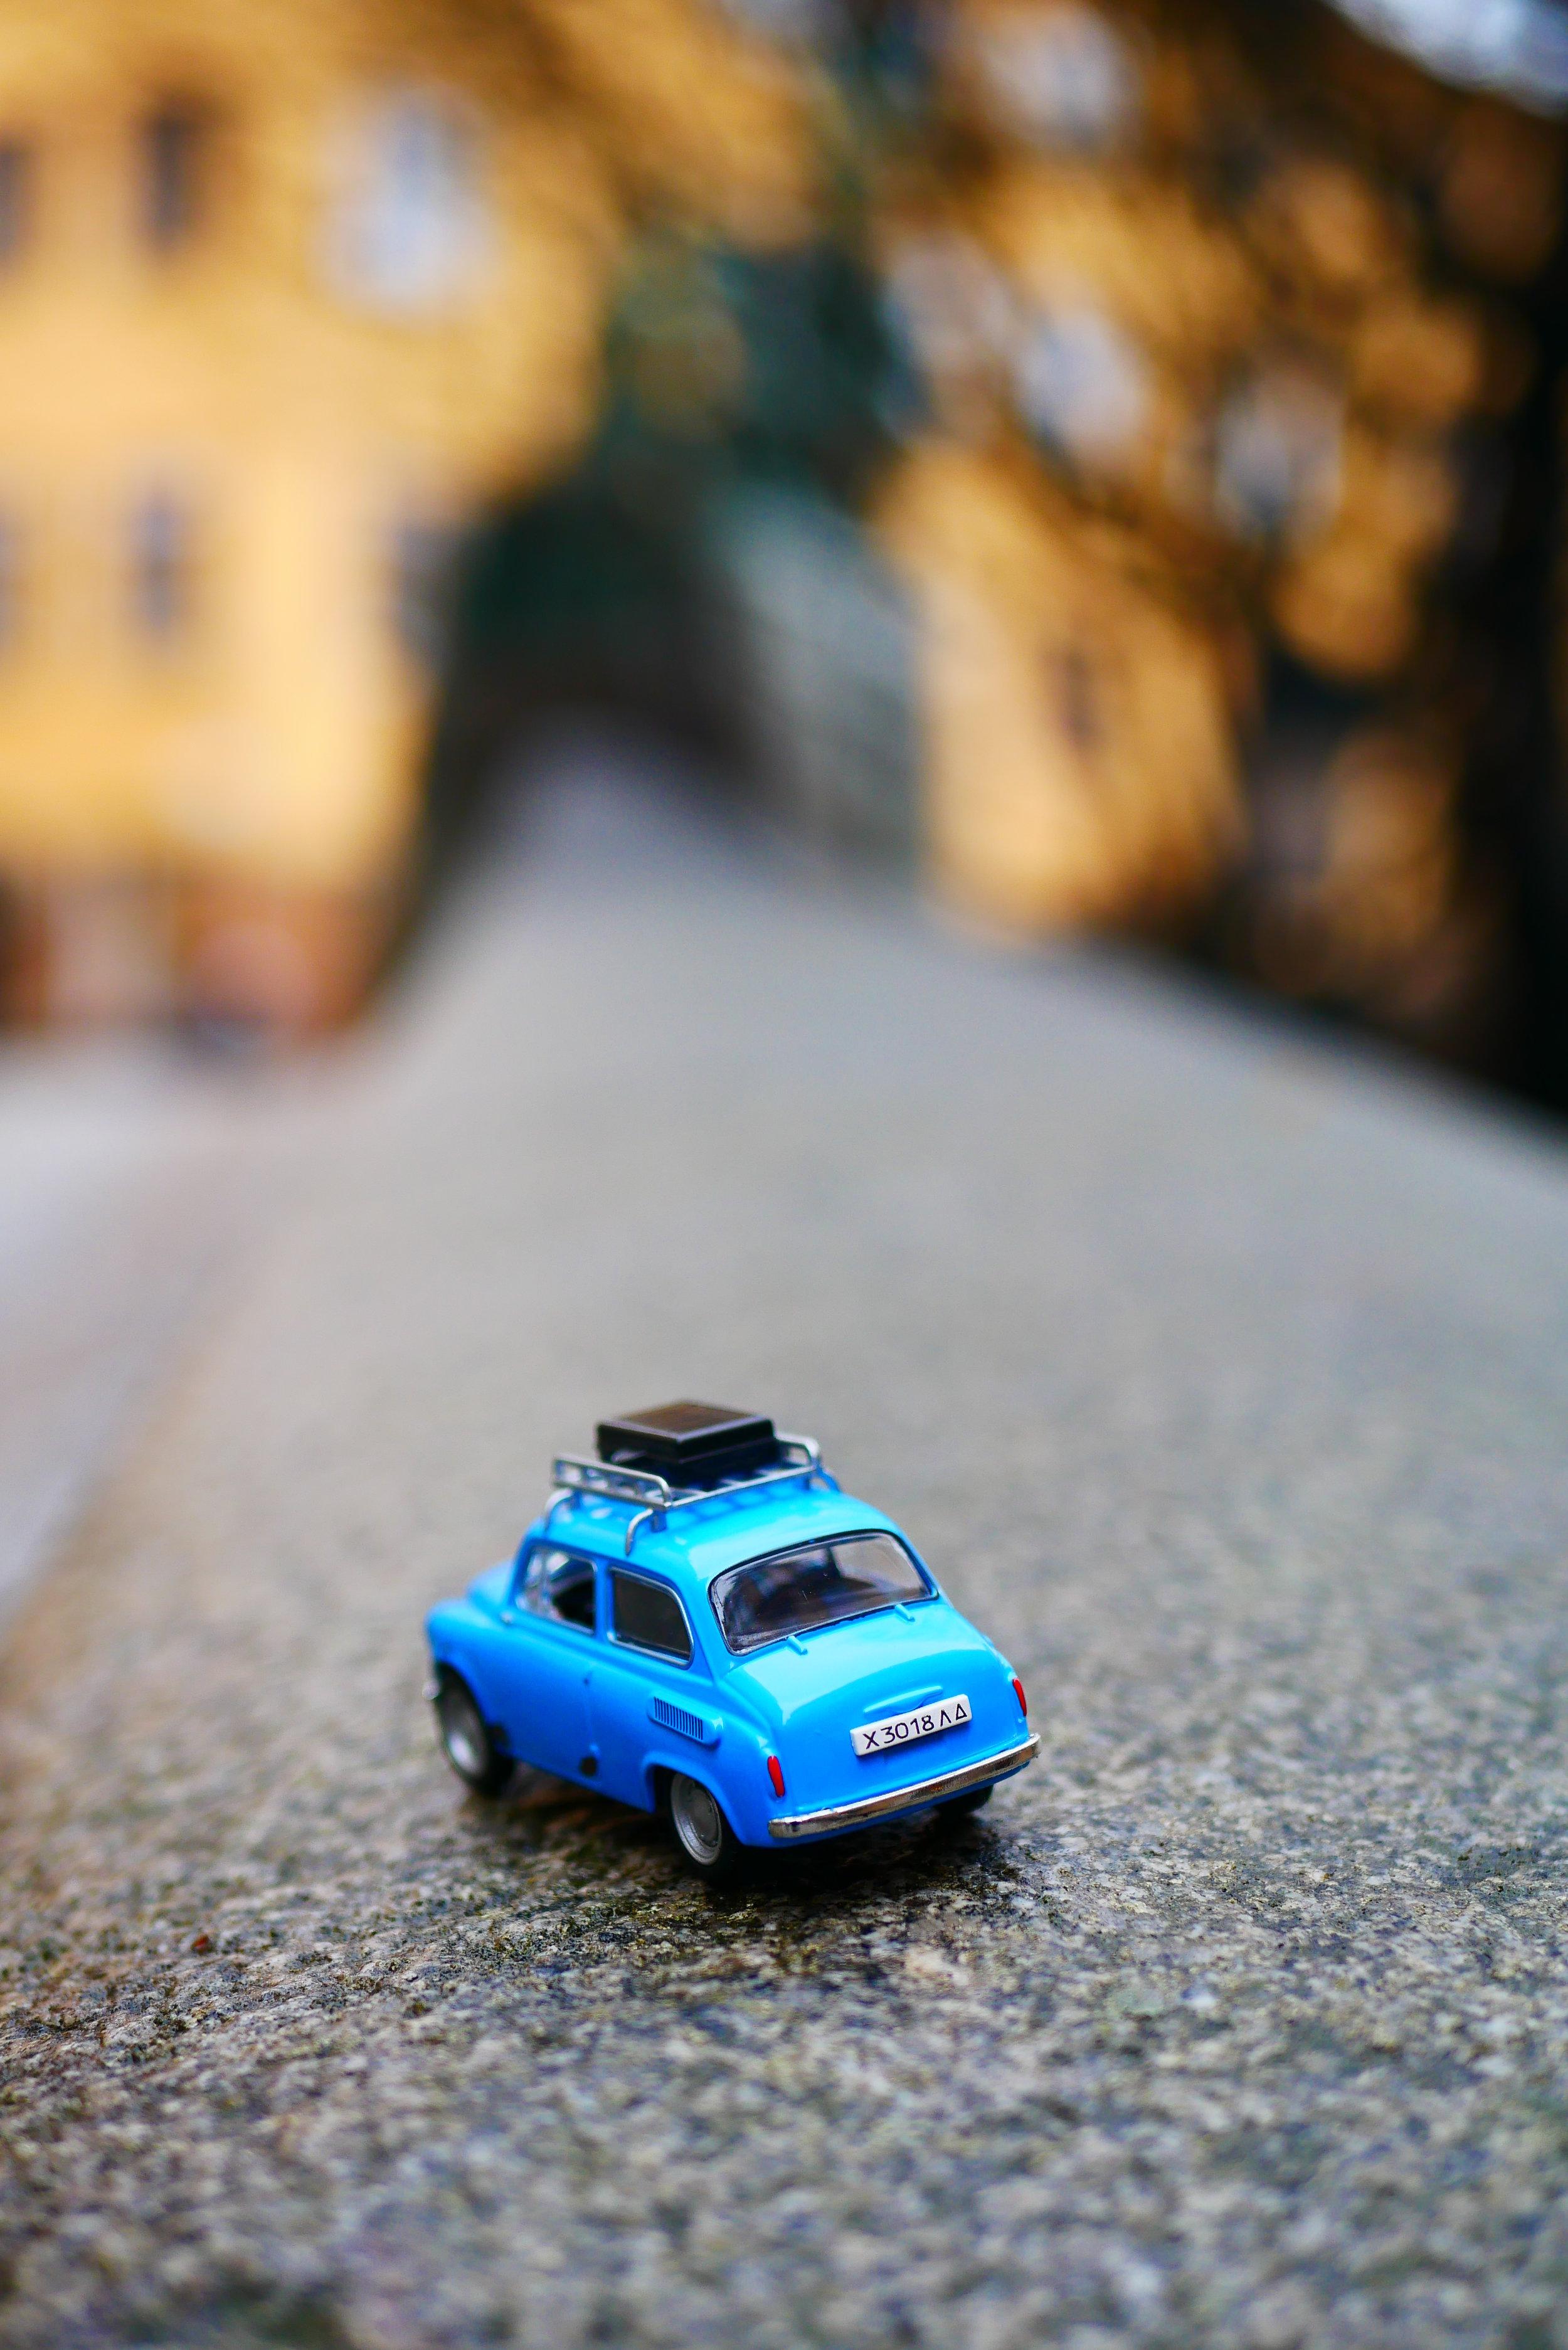 Taxi retro photo